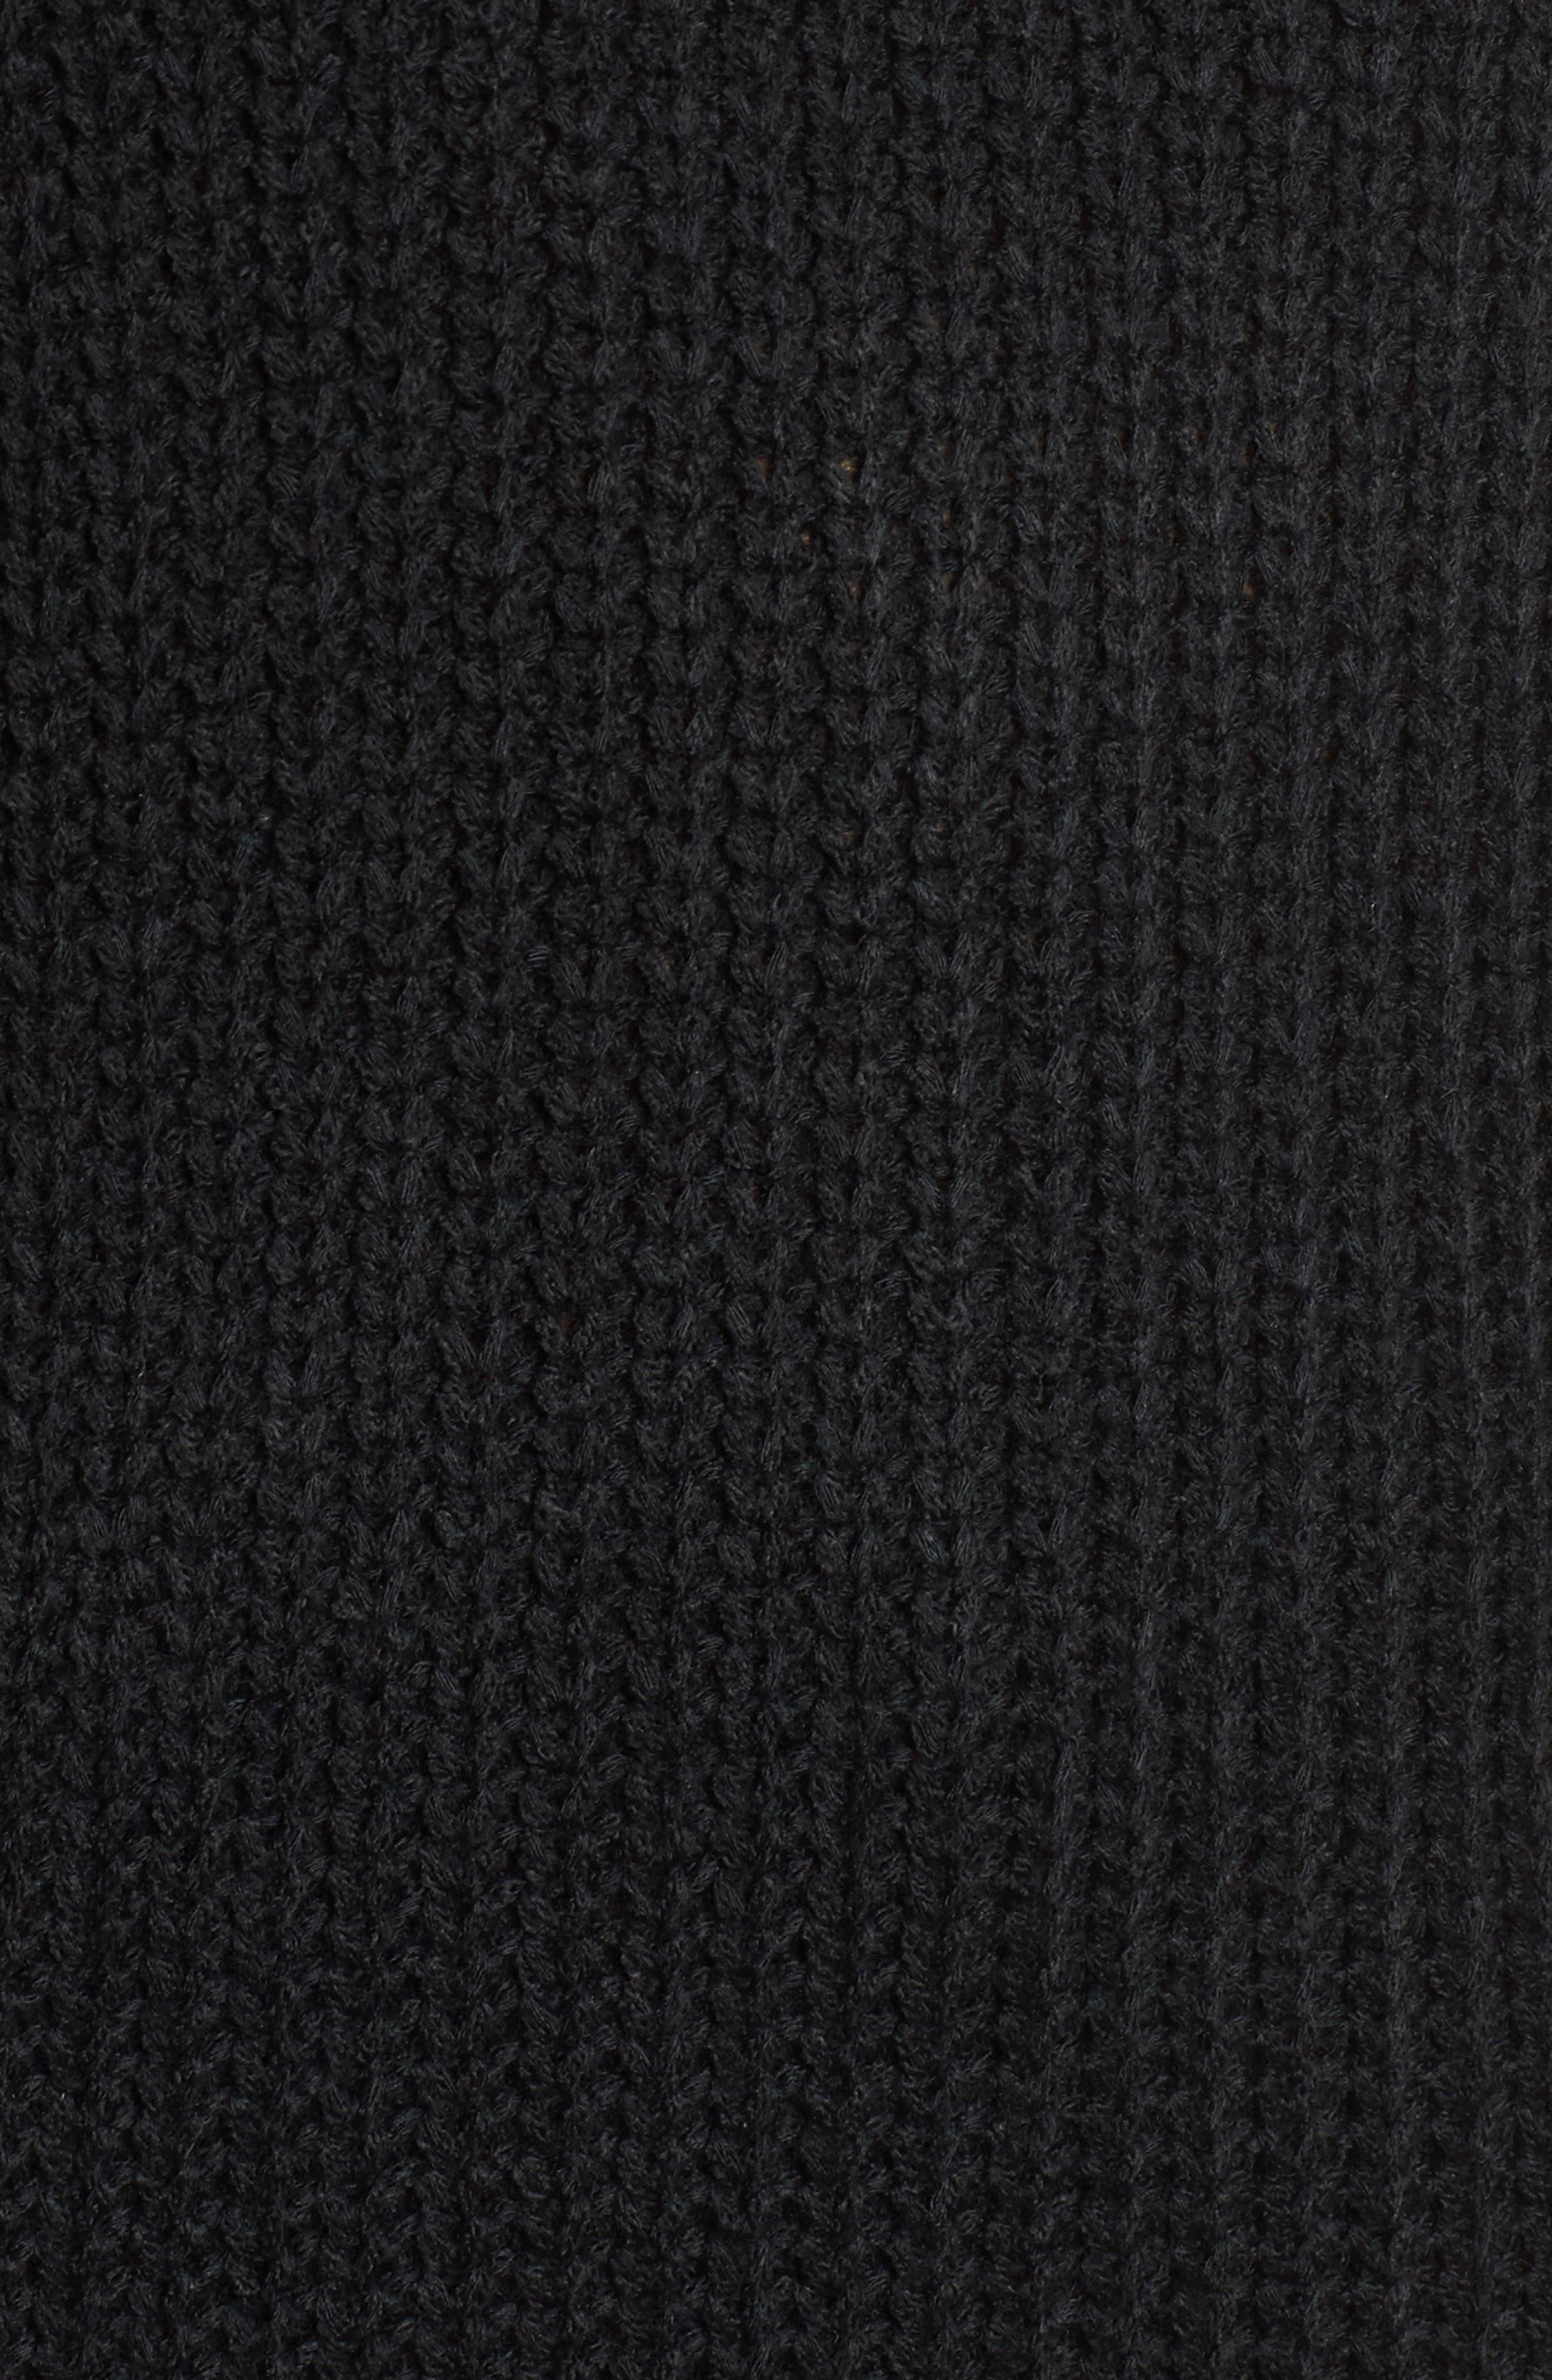 Sonya Open Back Sweater,                             Alternate thumbnail 5, color,                             001